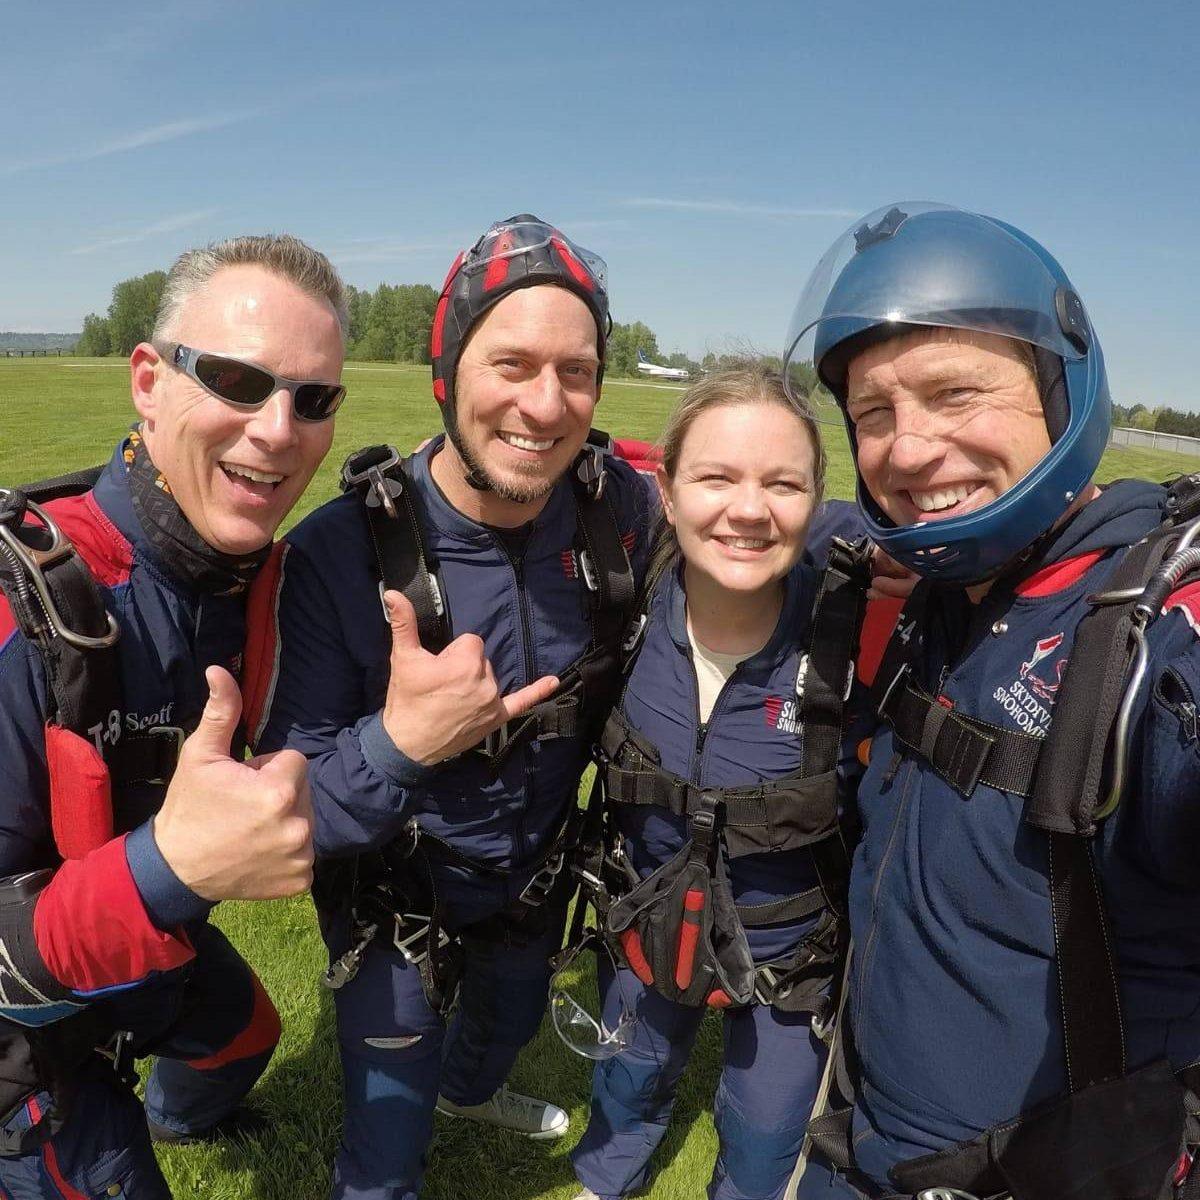 Tandem instructors smiling at Skydive Snohomish landing area.